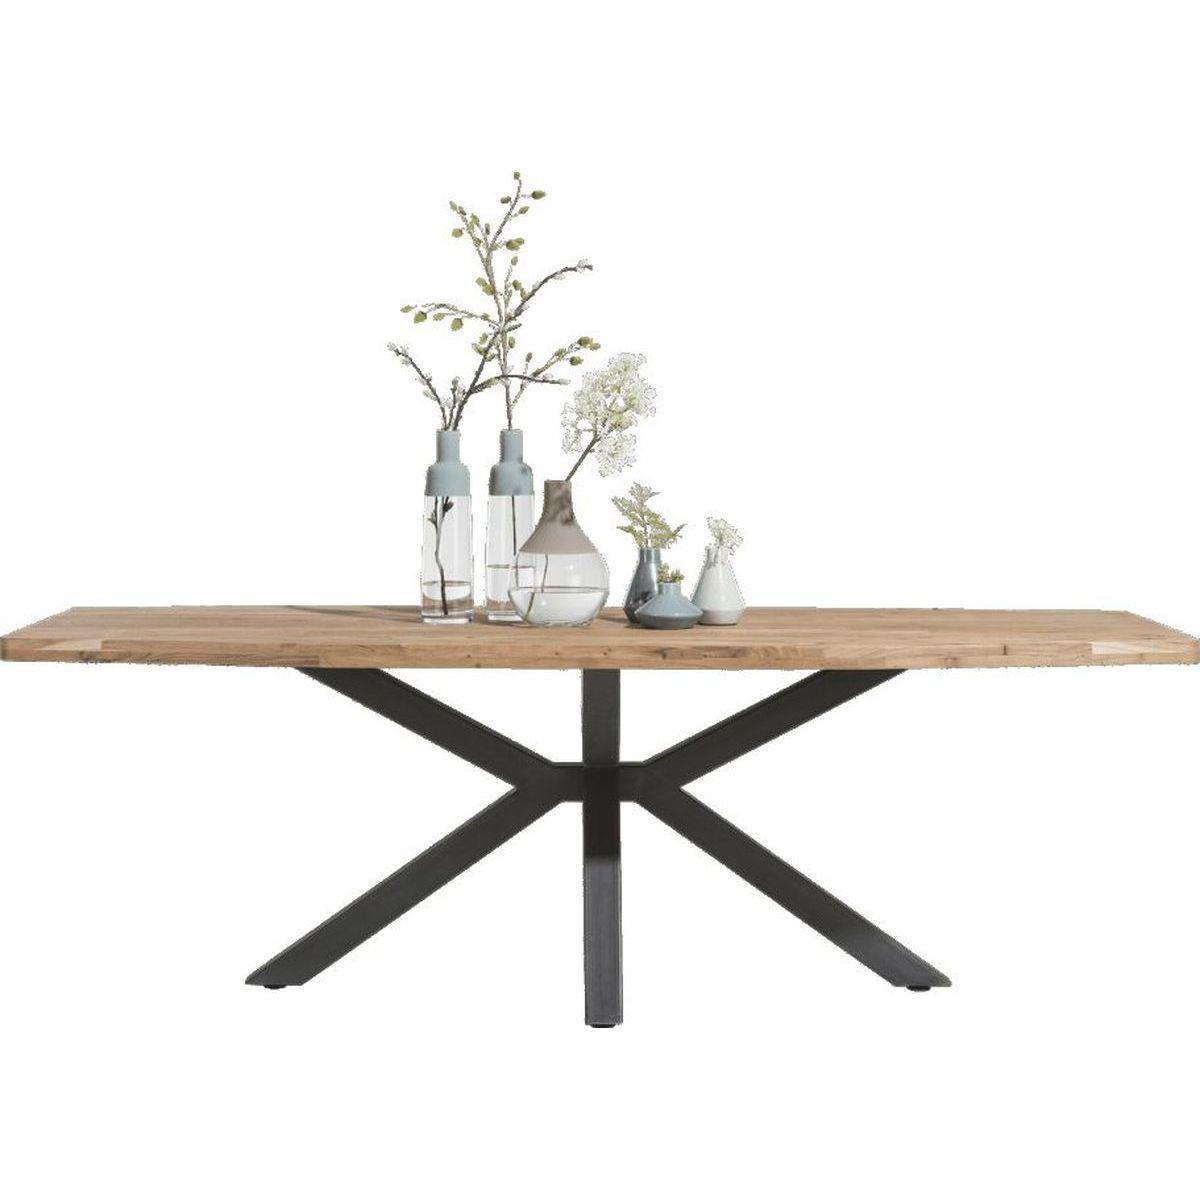 Table 180x100cm QUEBEC Henders & Hazel pied noir